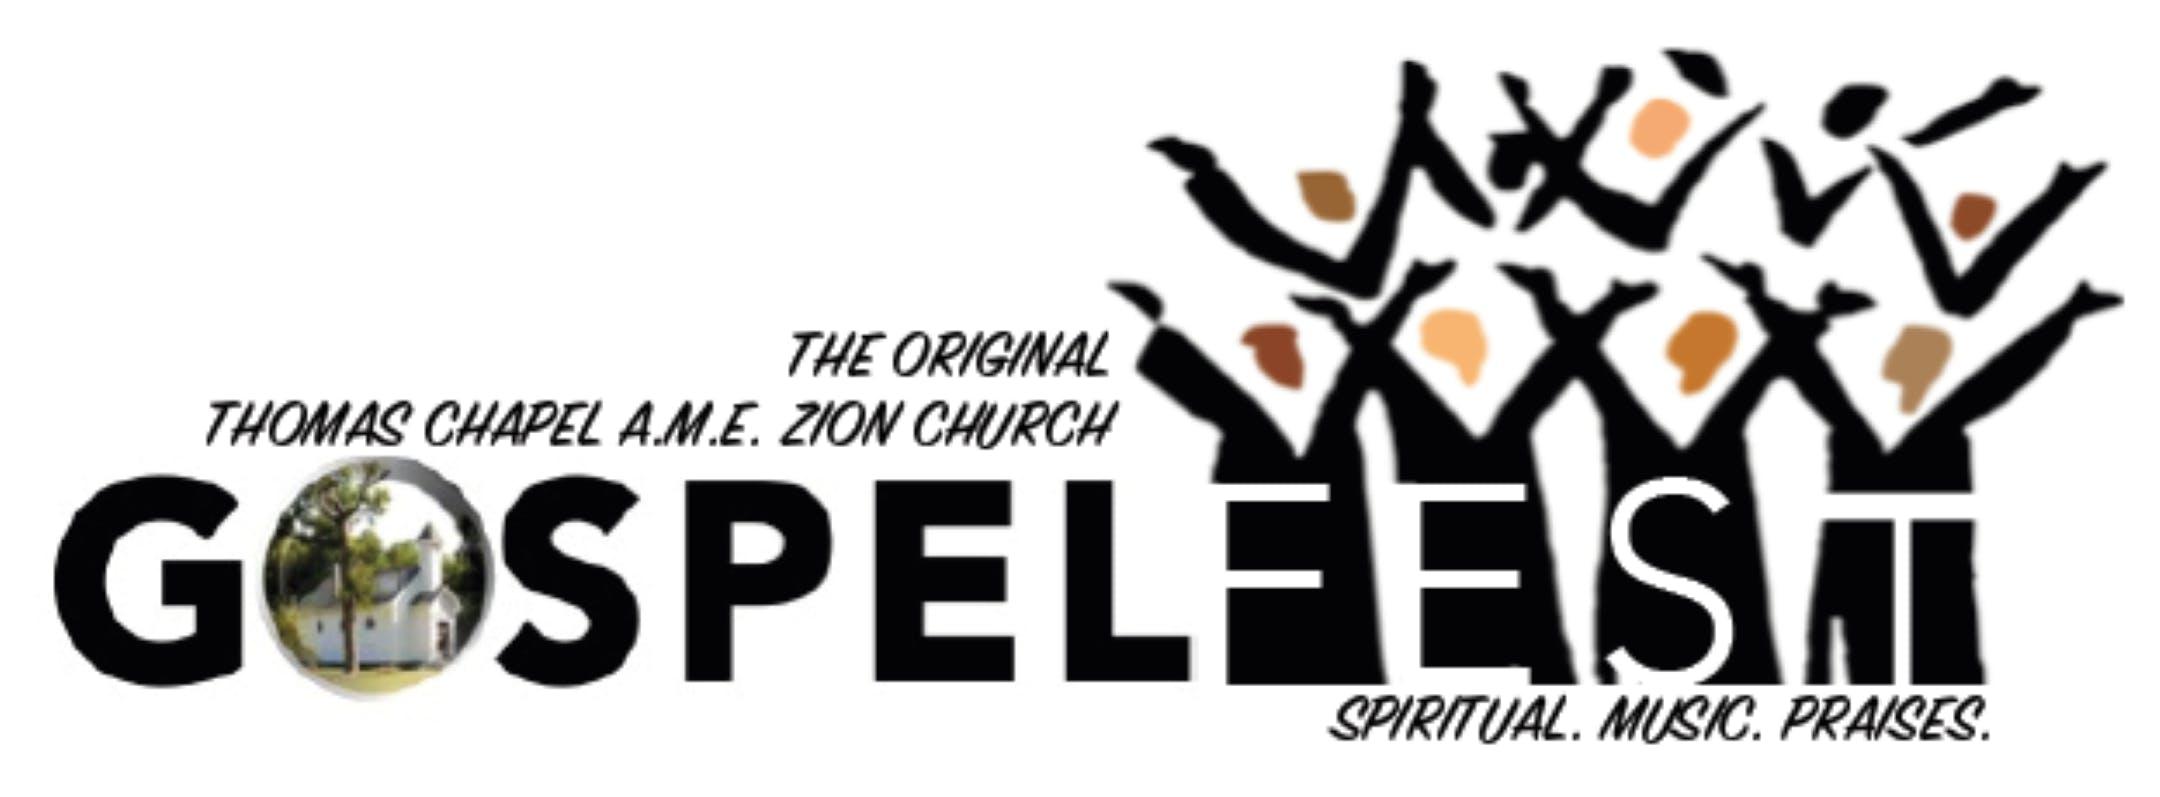 GospelFest 2019 - Black Mountain, NC